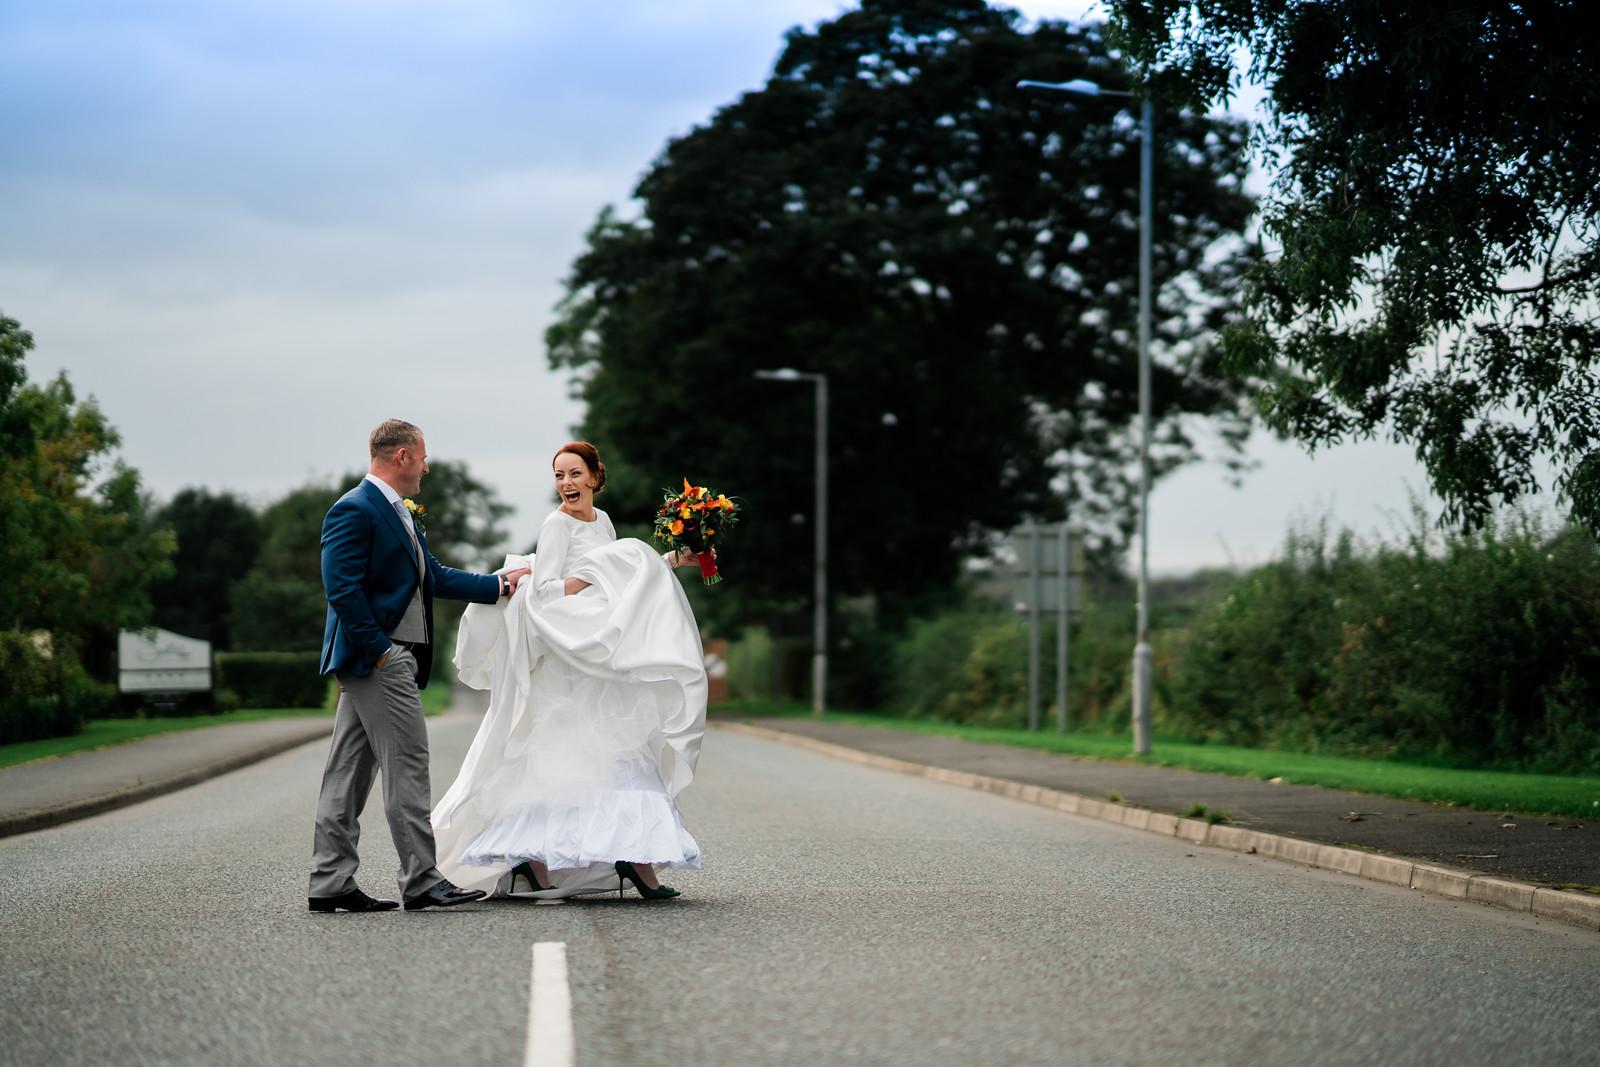 A Fun Wedding Photo of Bride and Groom - Hampshire Wedding Photographers